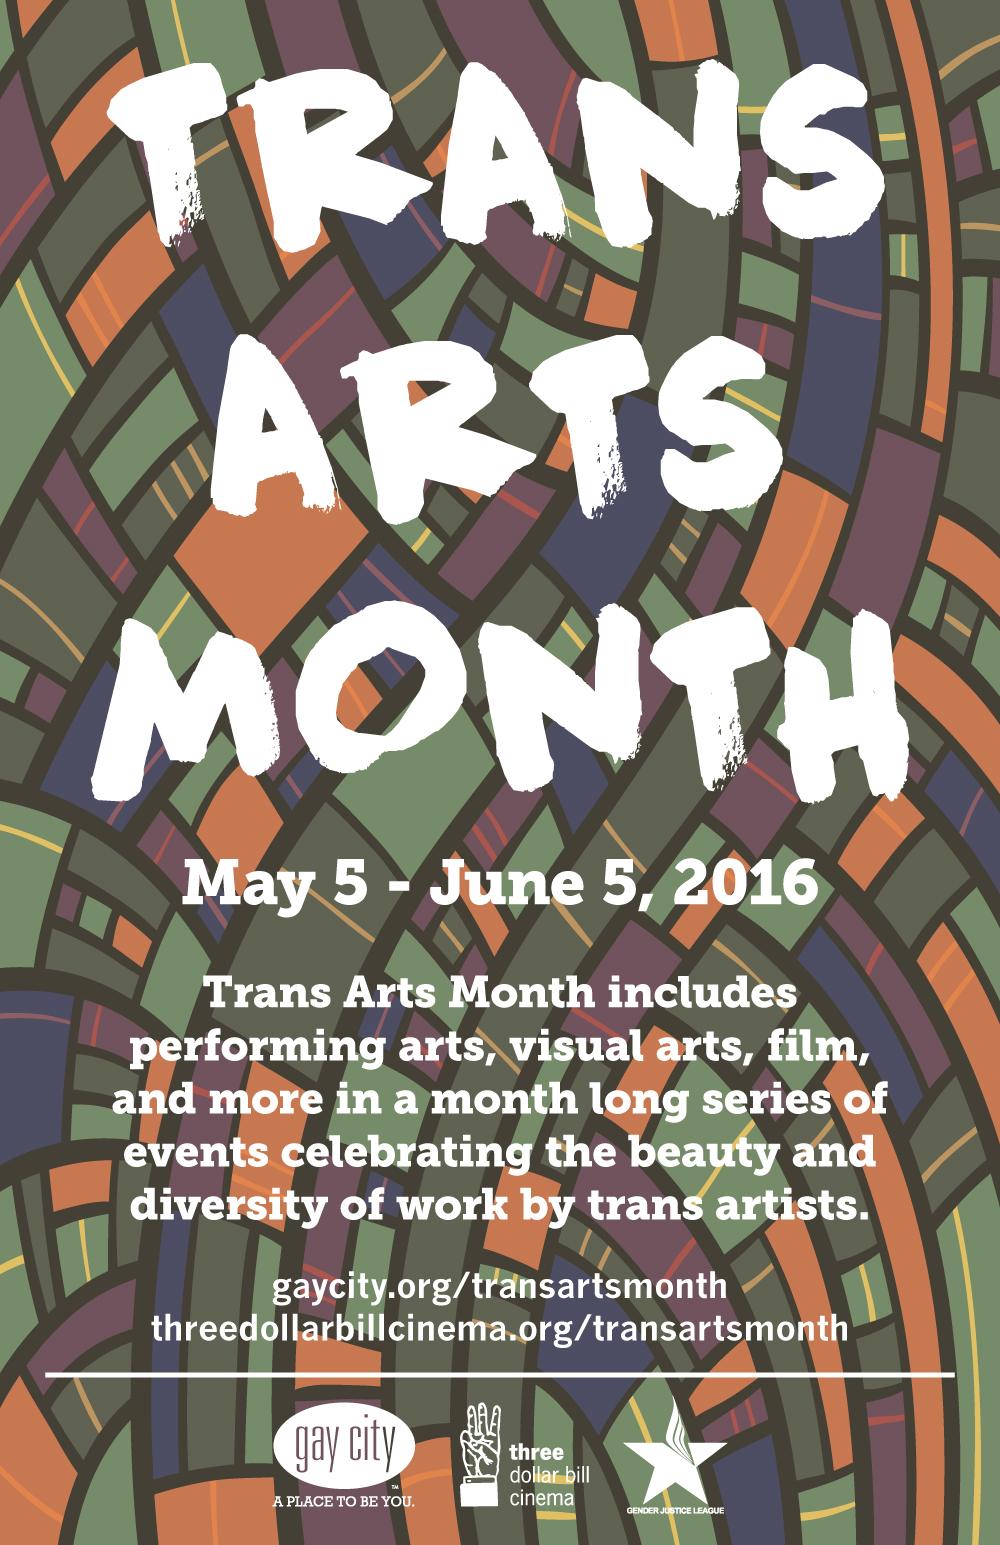 Trans Arts Month